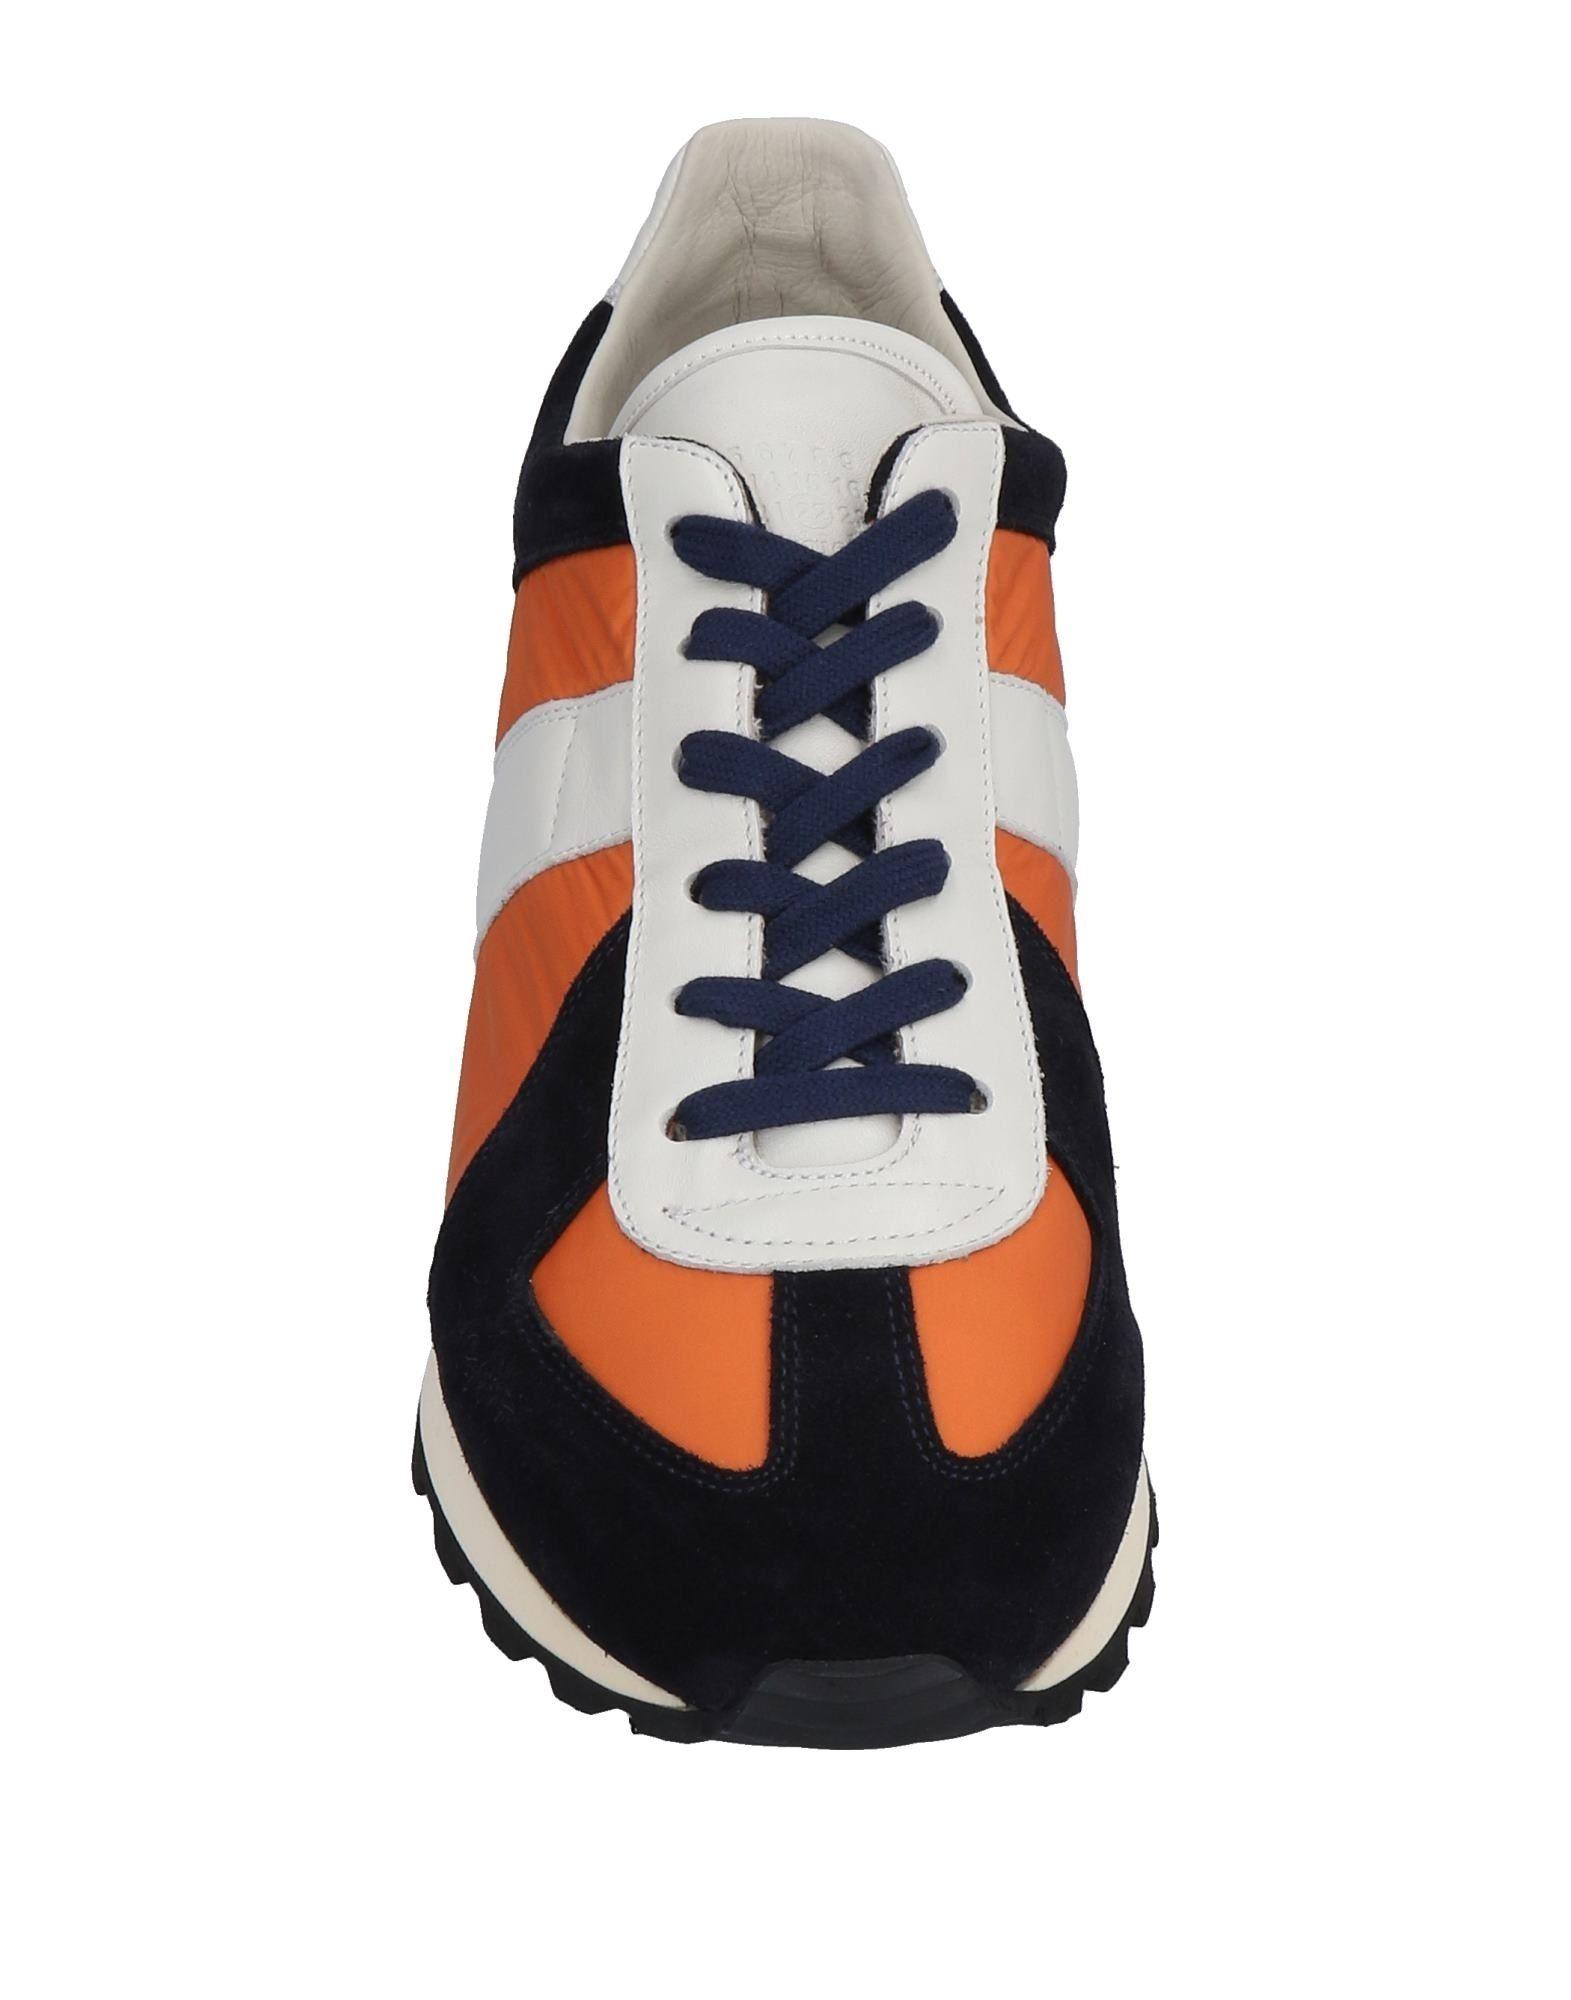 Maison Margiela Sneakers Herren  11472848PX 11472848PX  6919b9